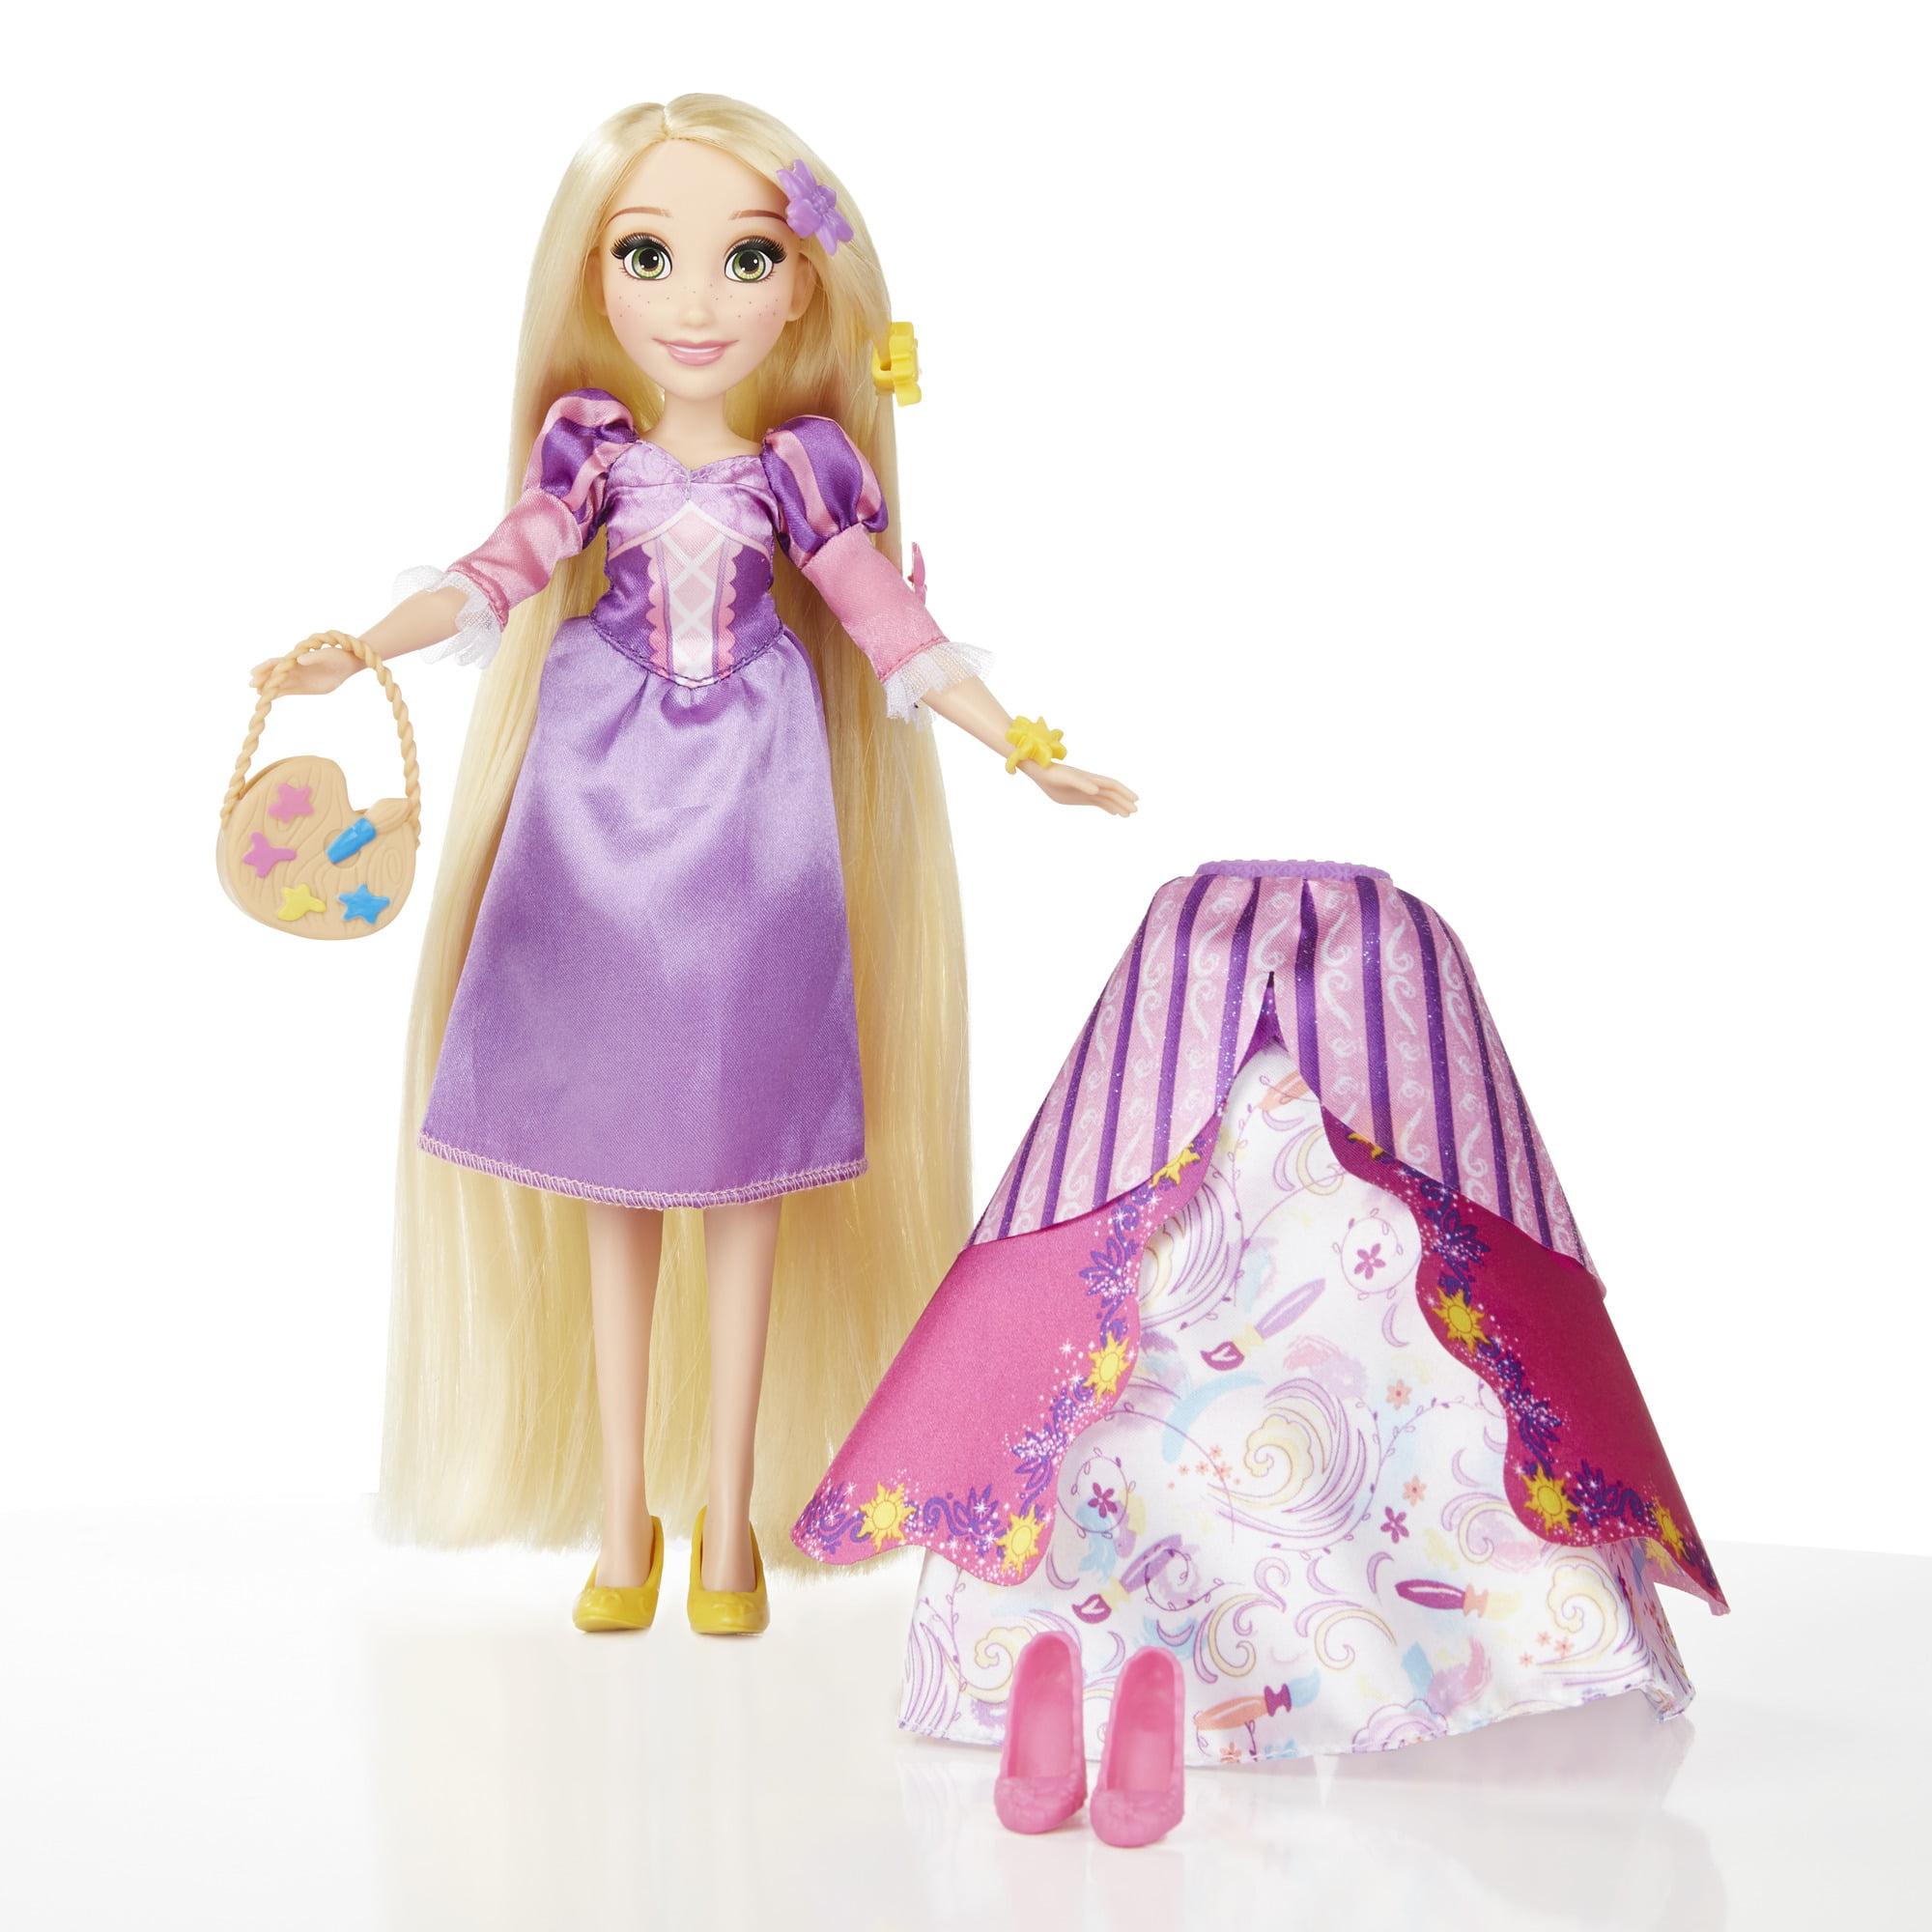 Hasbro Disney Princess Layer 'n Style Rapunzel Ages 3+ by Hasbro